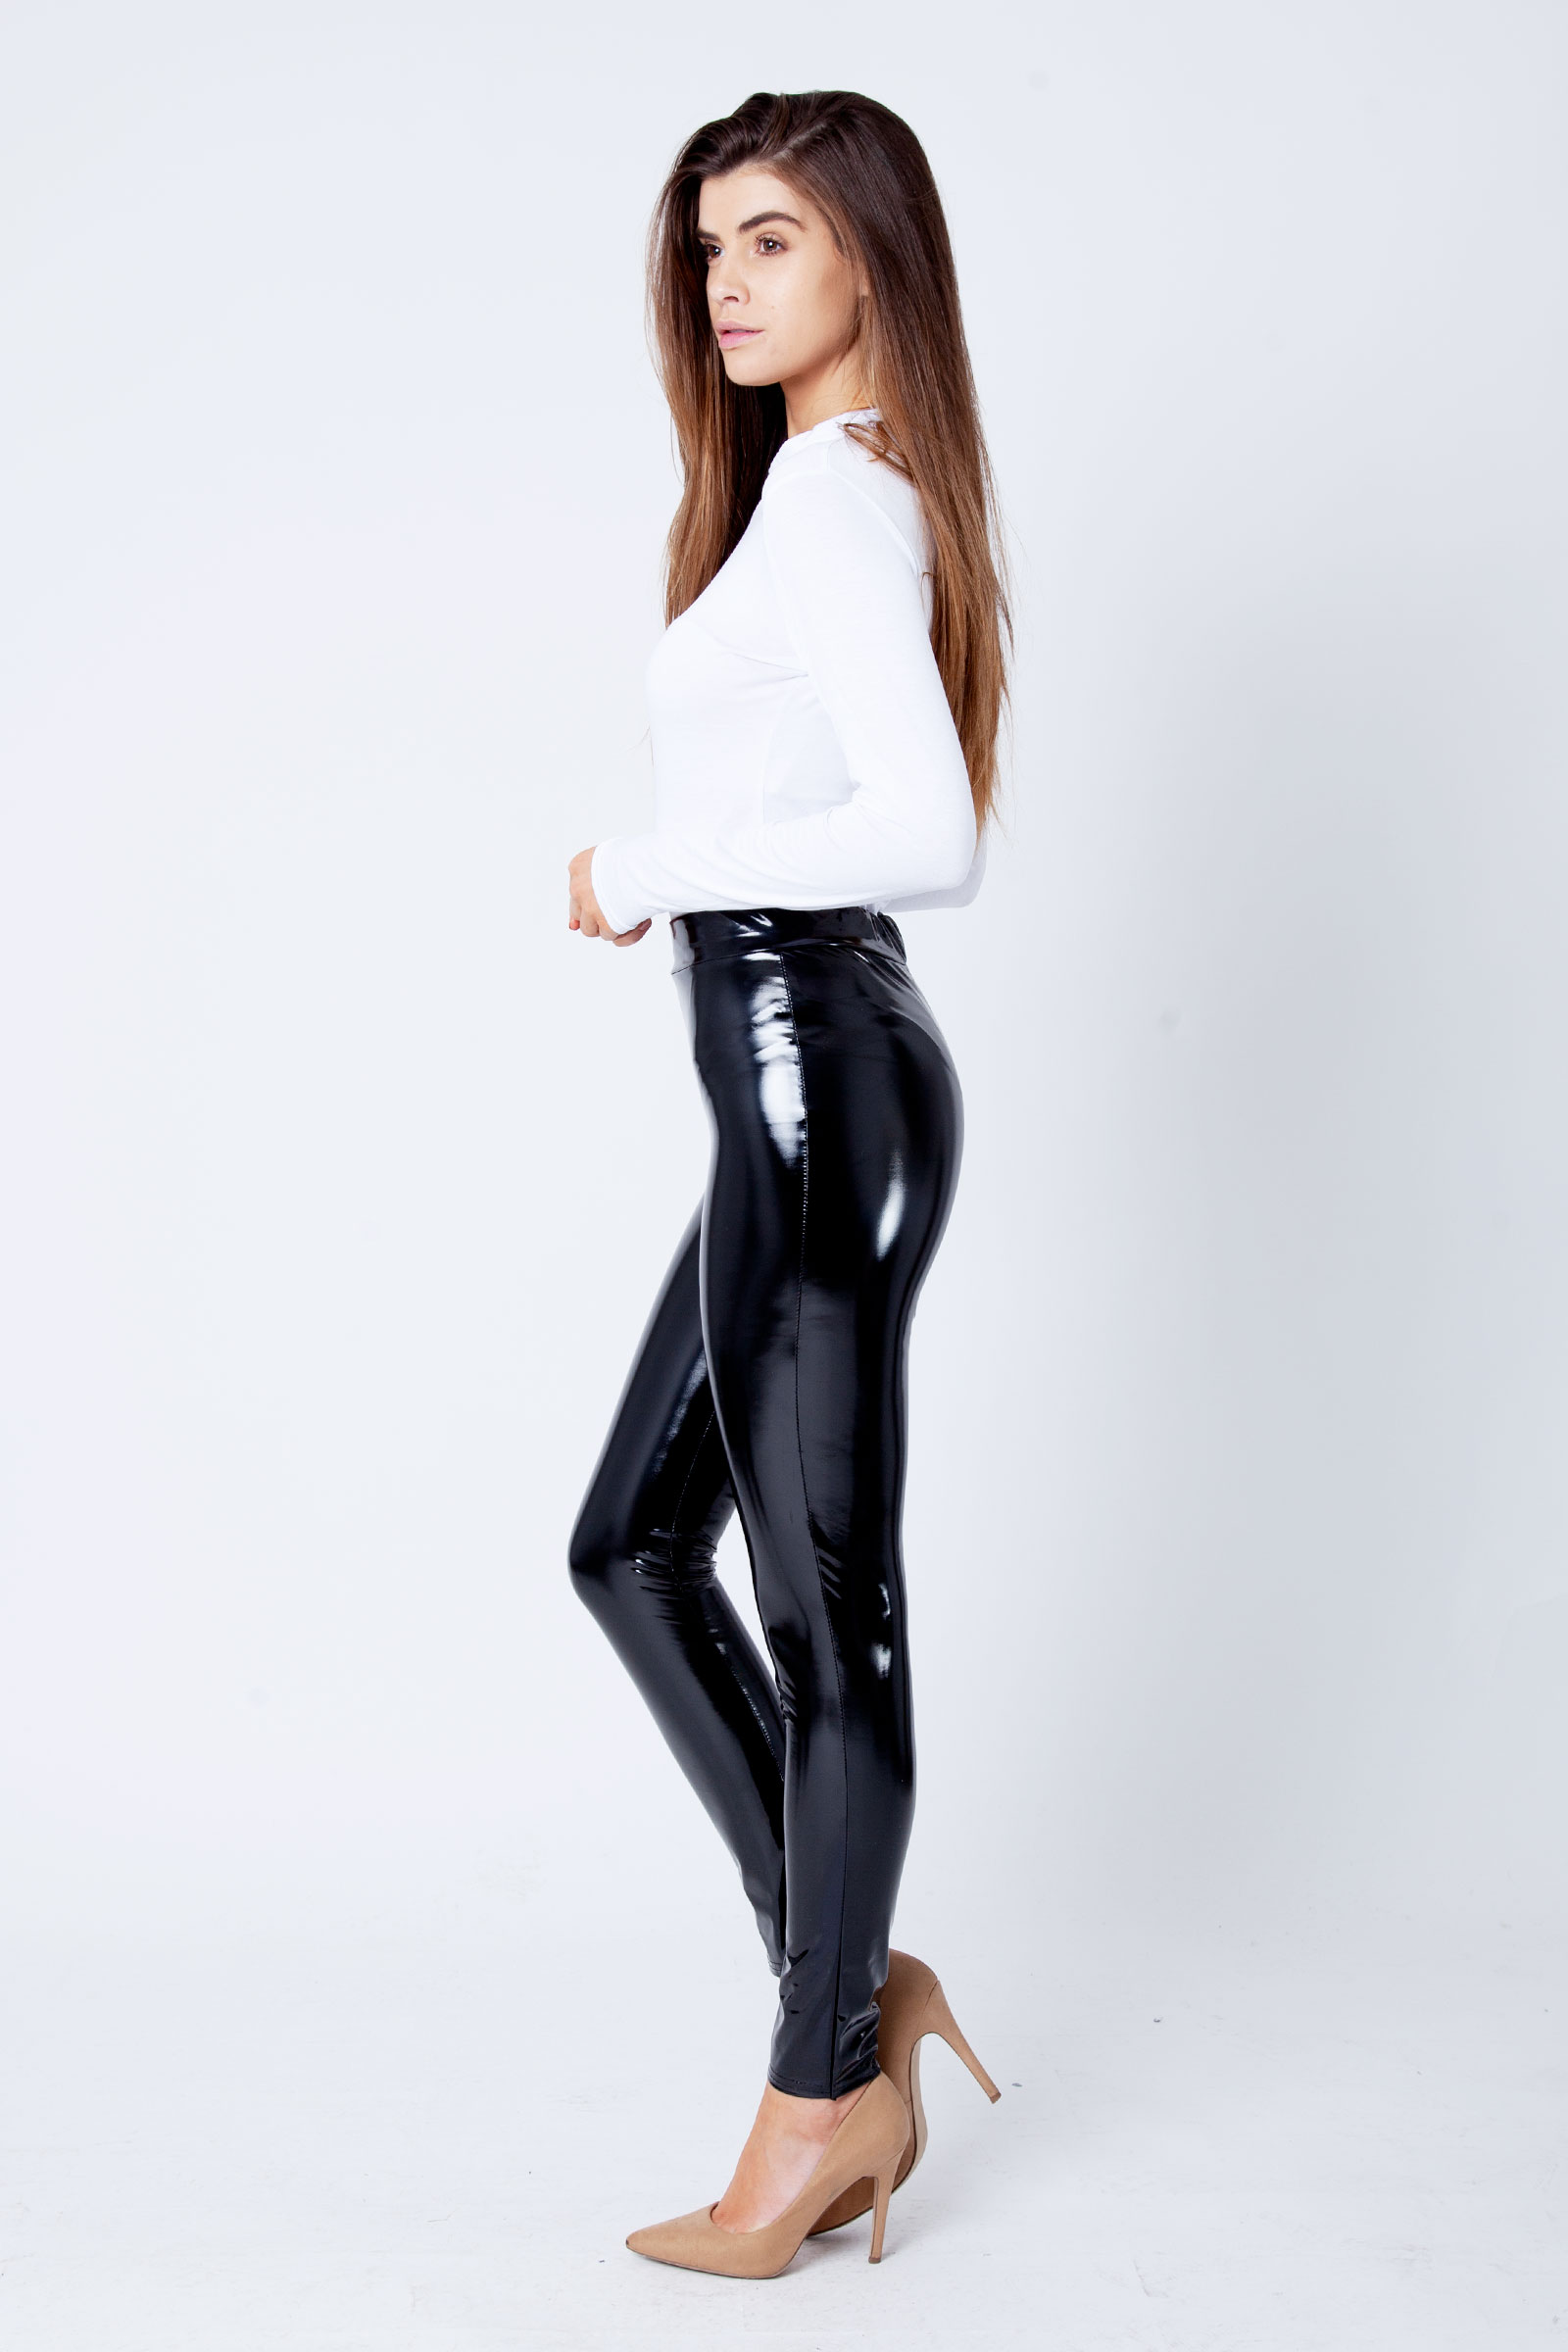 caec5fc4eeca9 Black Wet Look Shiny Leggings for sale| Fashion -Modamore